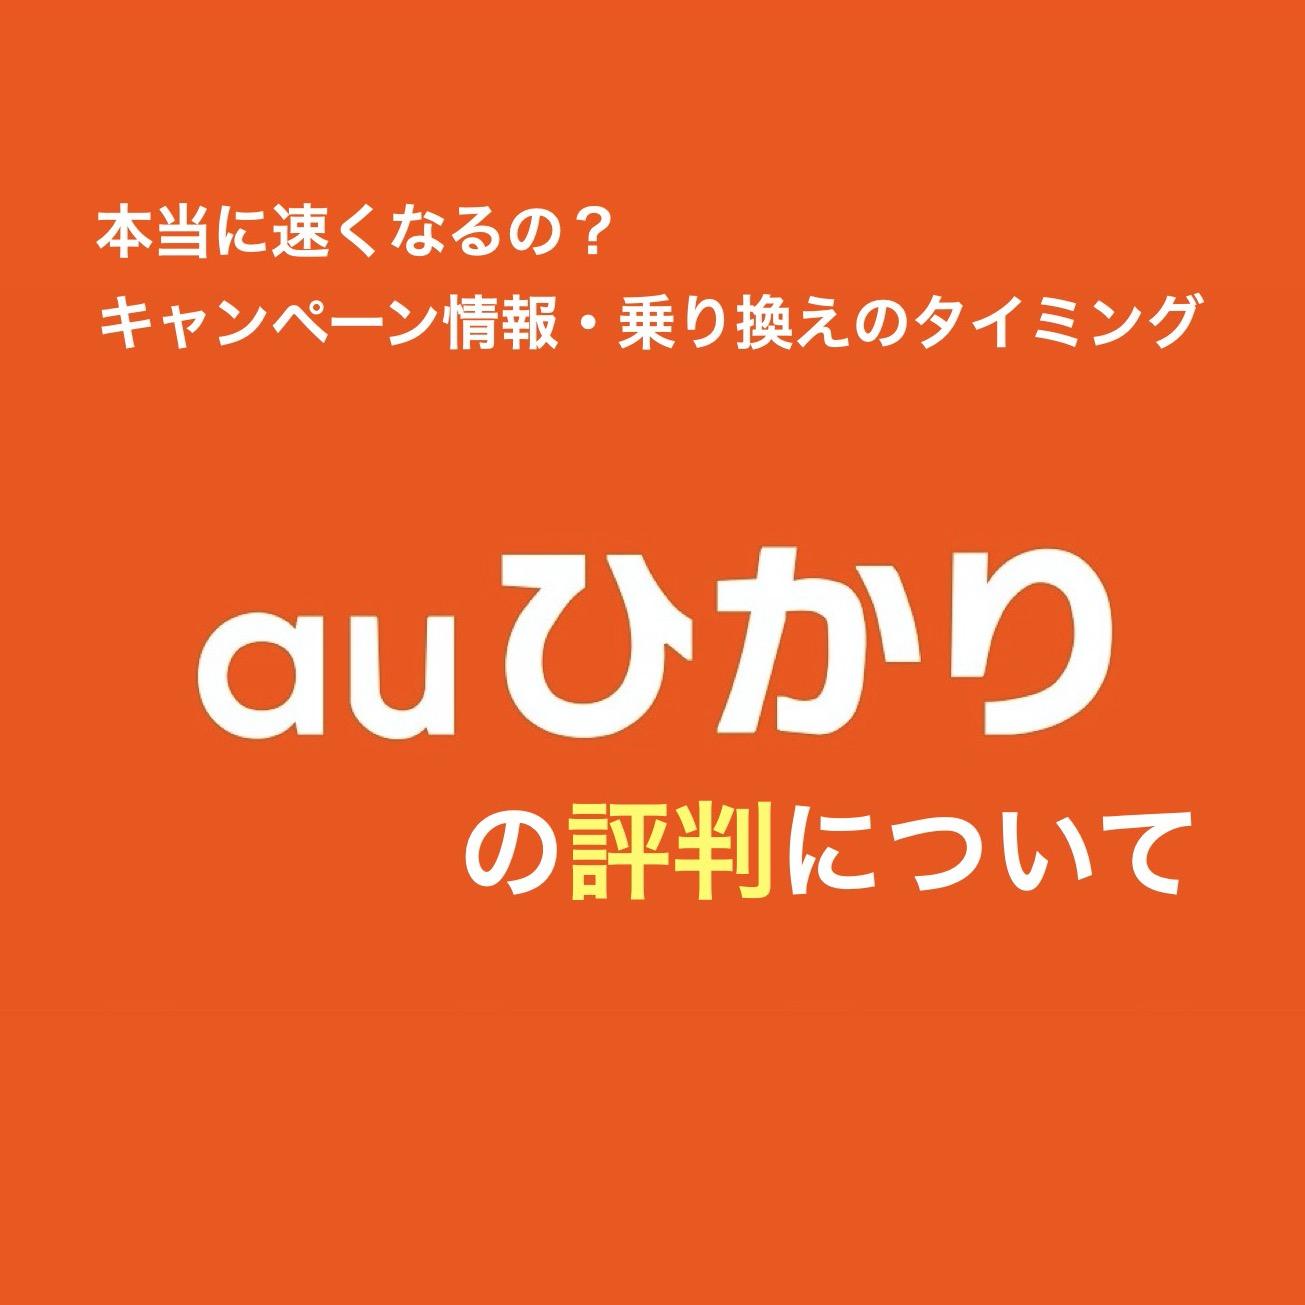 auひかりの評判・レビューまとめ(速度・乗り換えの違約金は?)